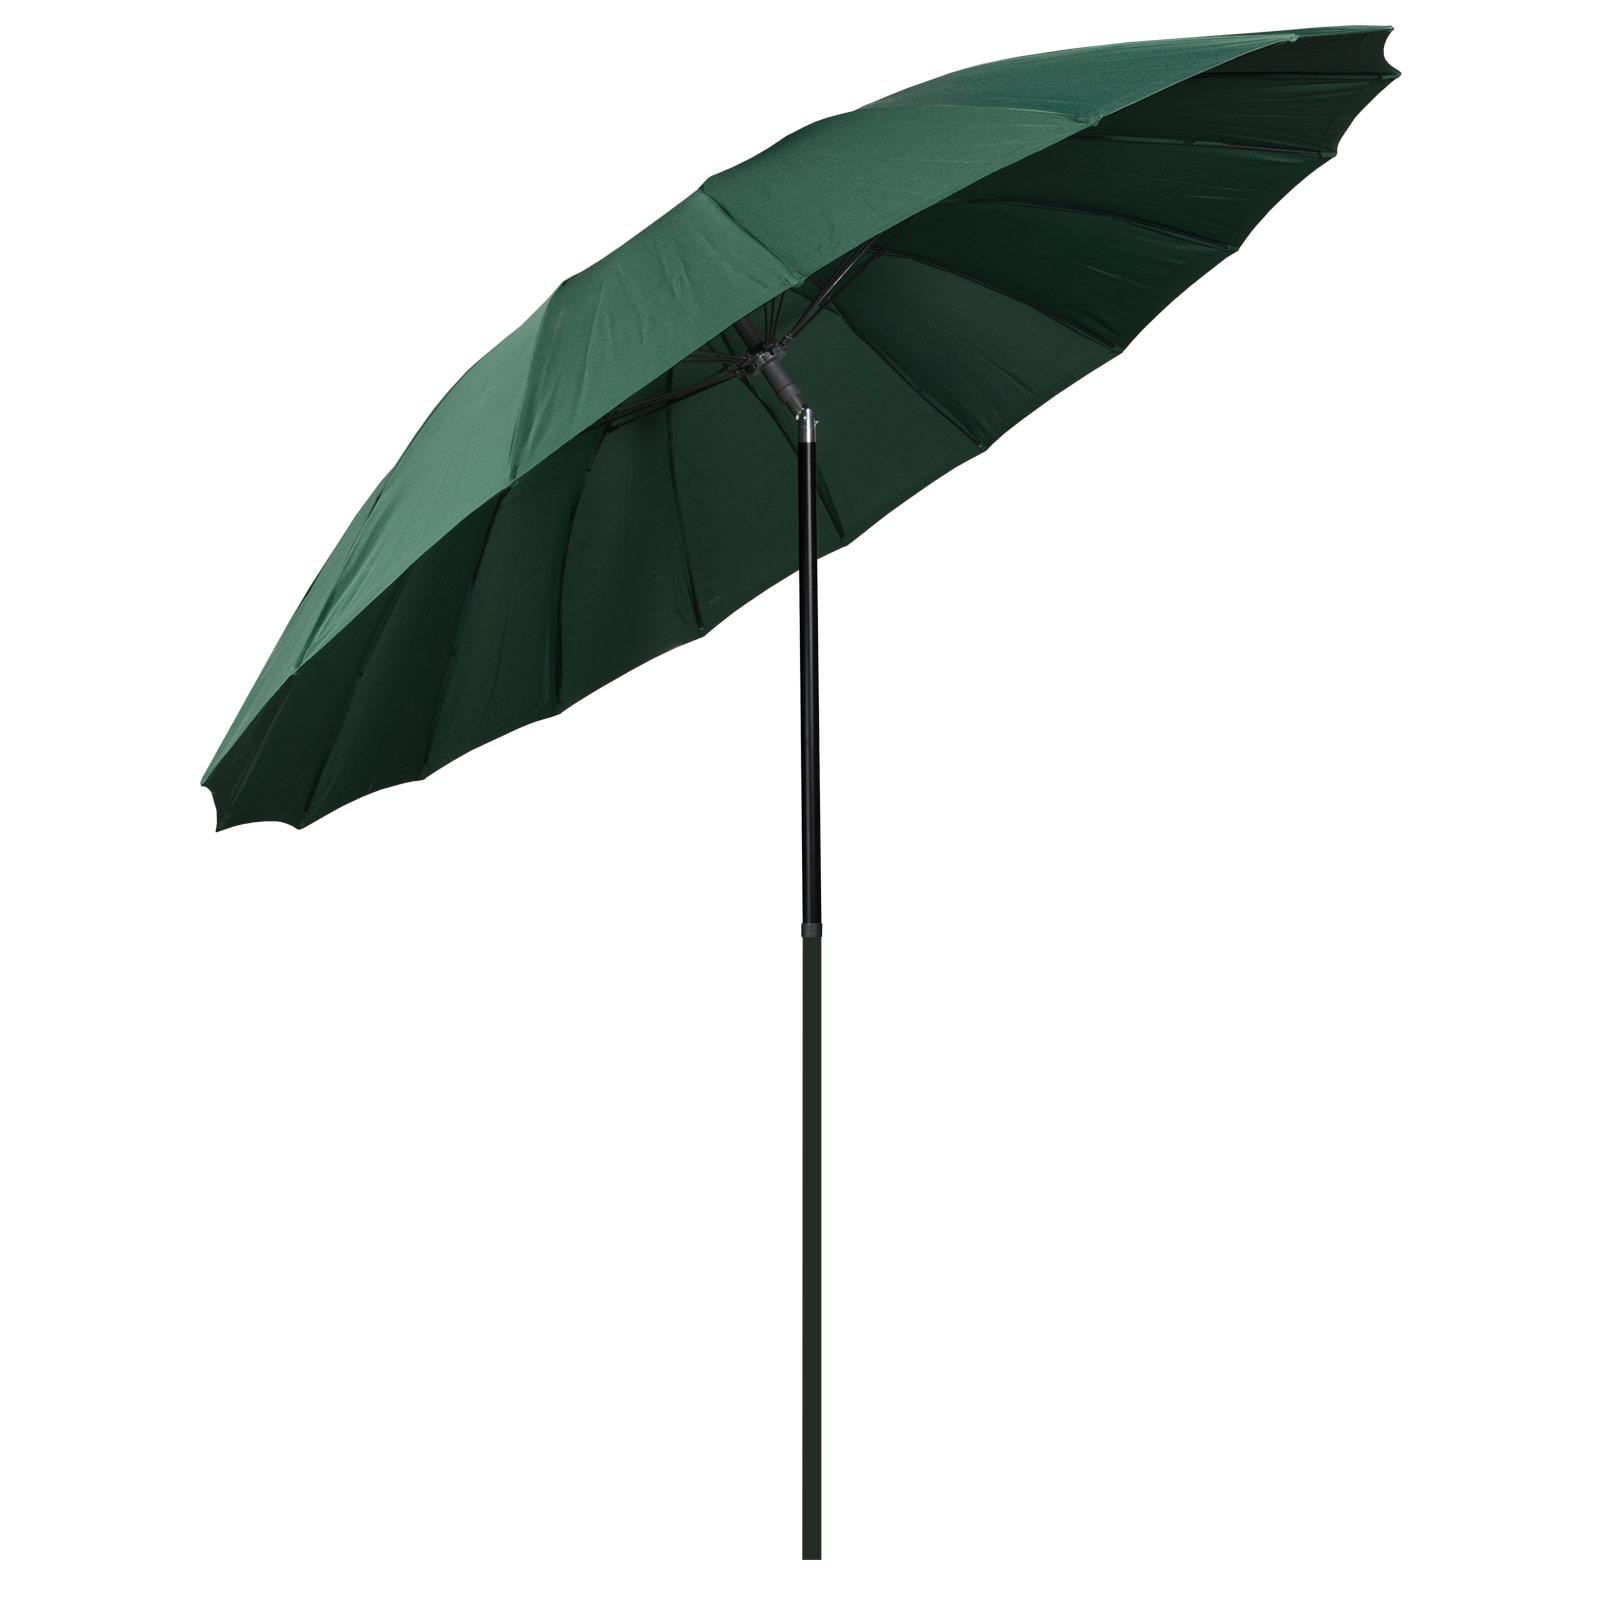 new tilting shanghai parasol umbrella sun shade for garden patio furniture. Black Bedroom Furniture Sets. Home Design Ideas